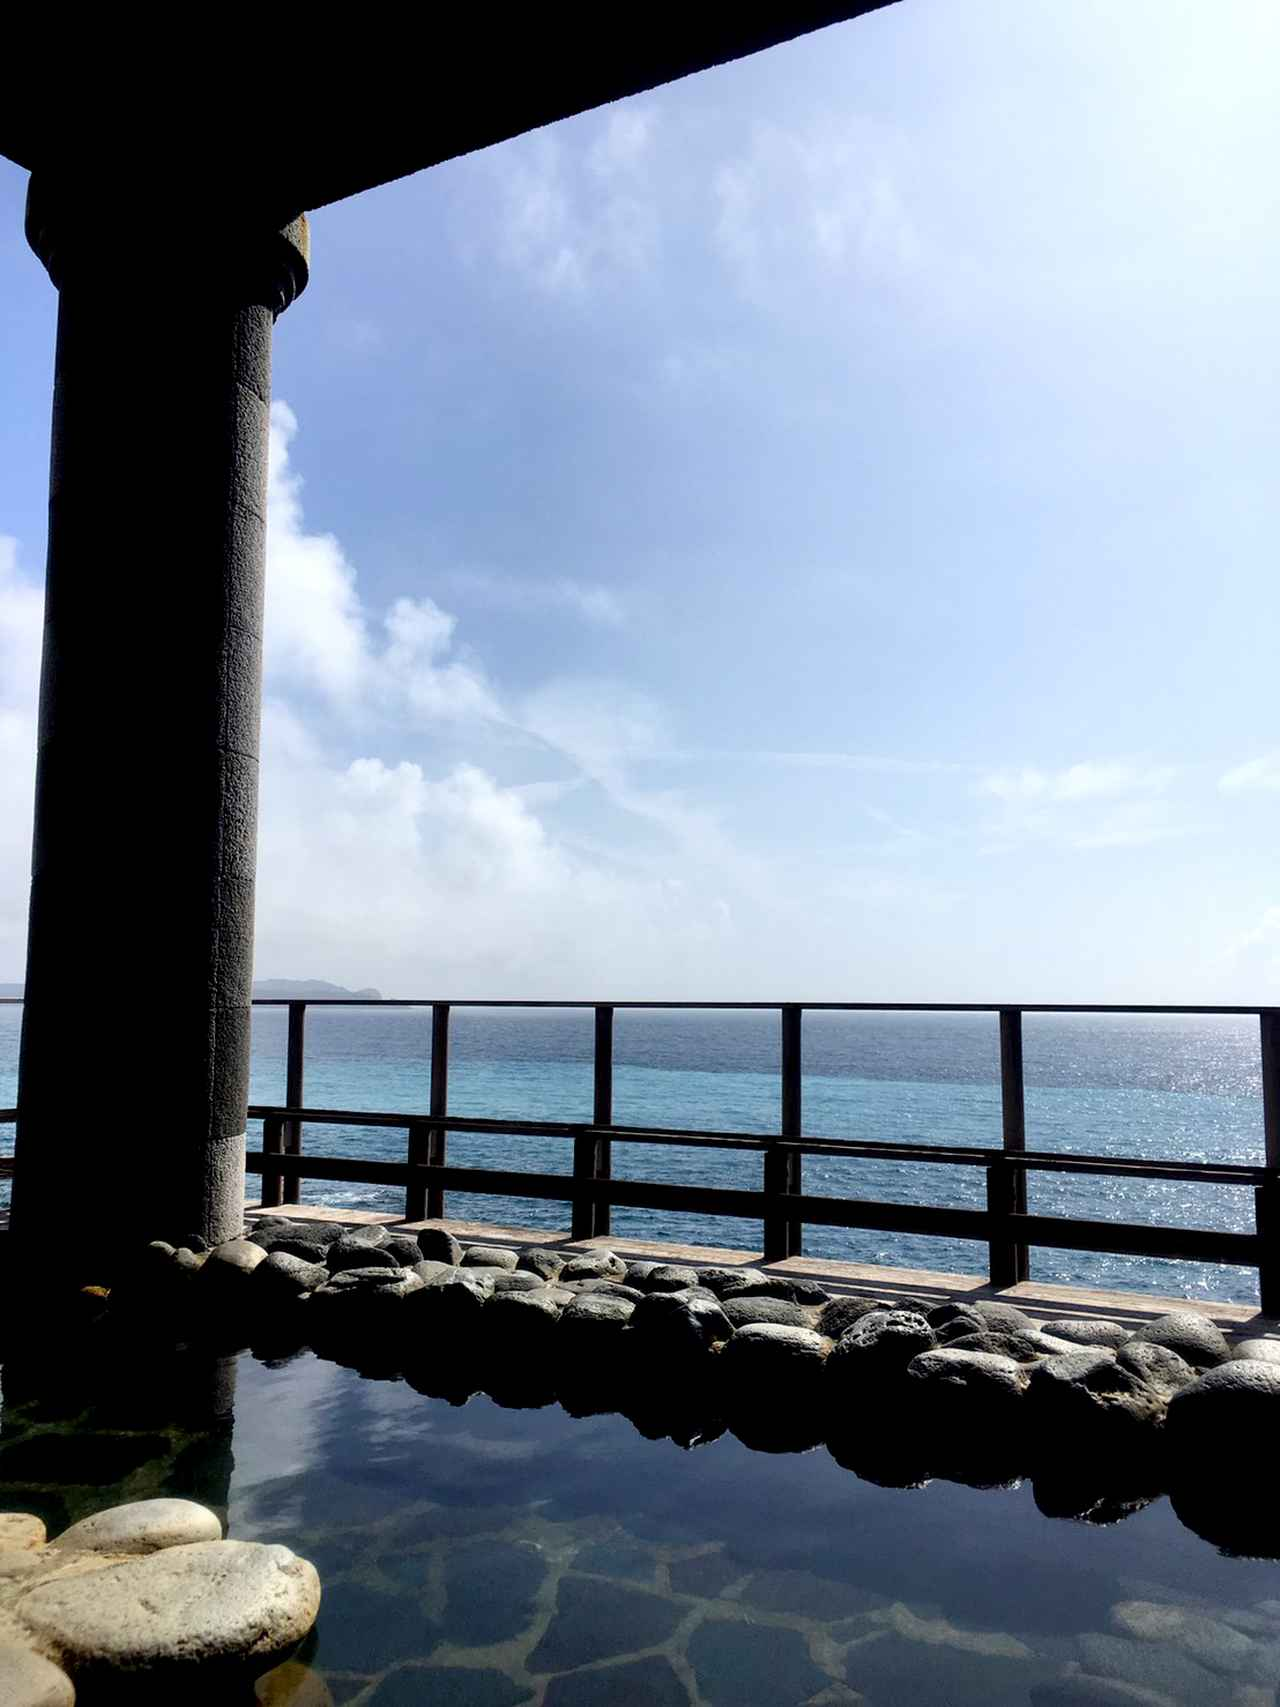 Images : 6番目の画像 - 湯の浜露天温泉 - webオートバイ